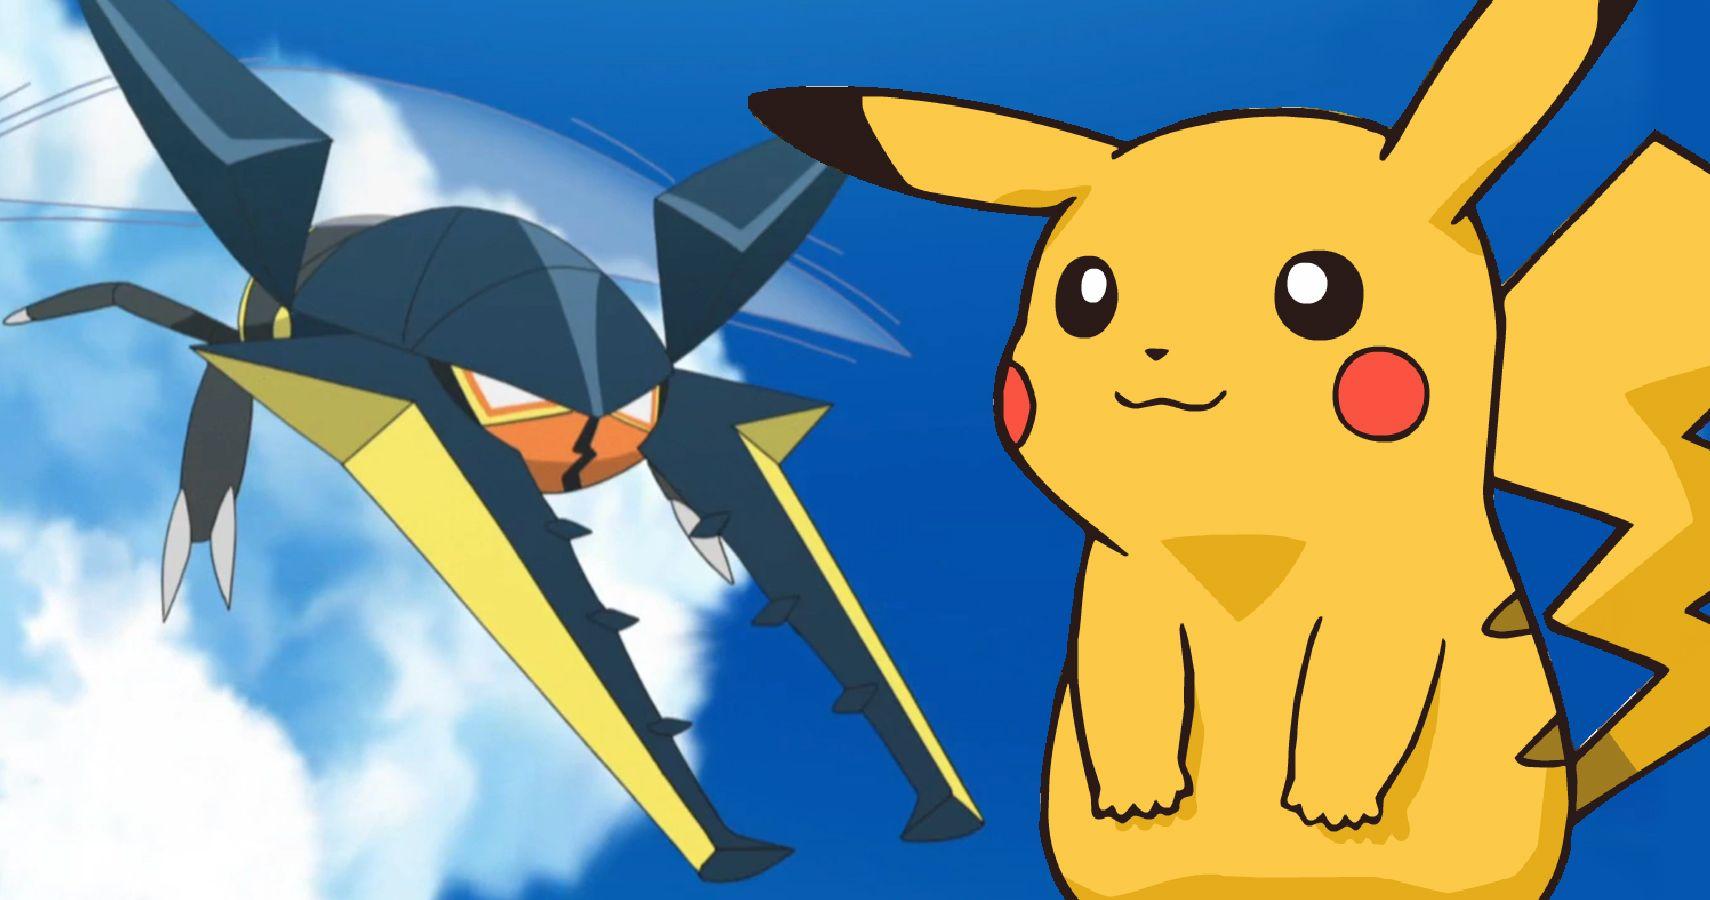 Pokémon The Best Electric Type Pokémon From Every Generation Ranked